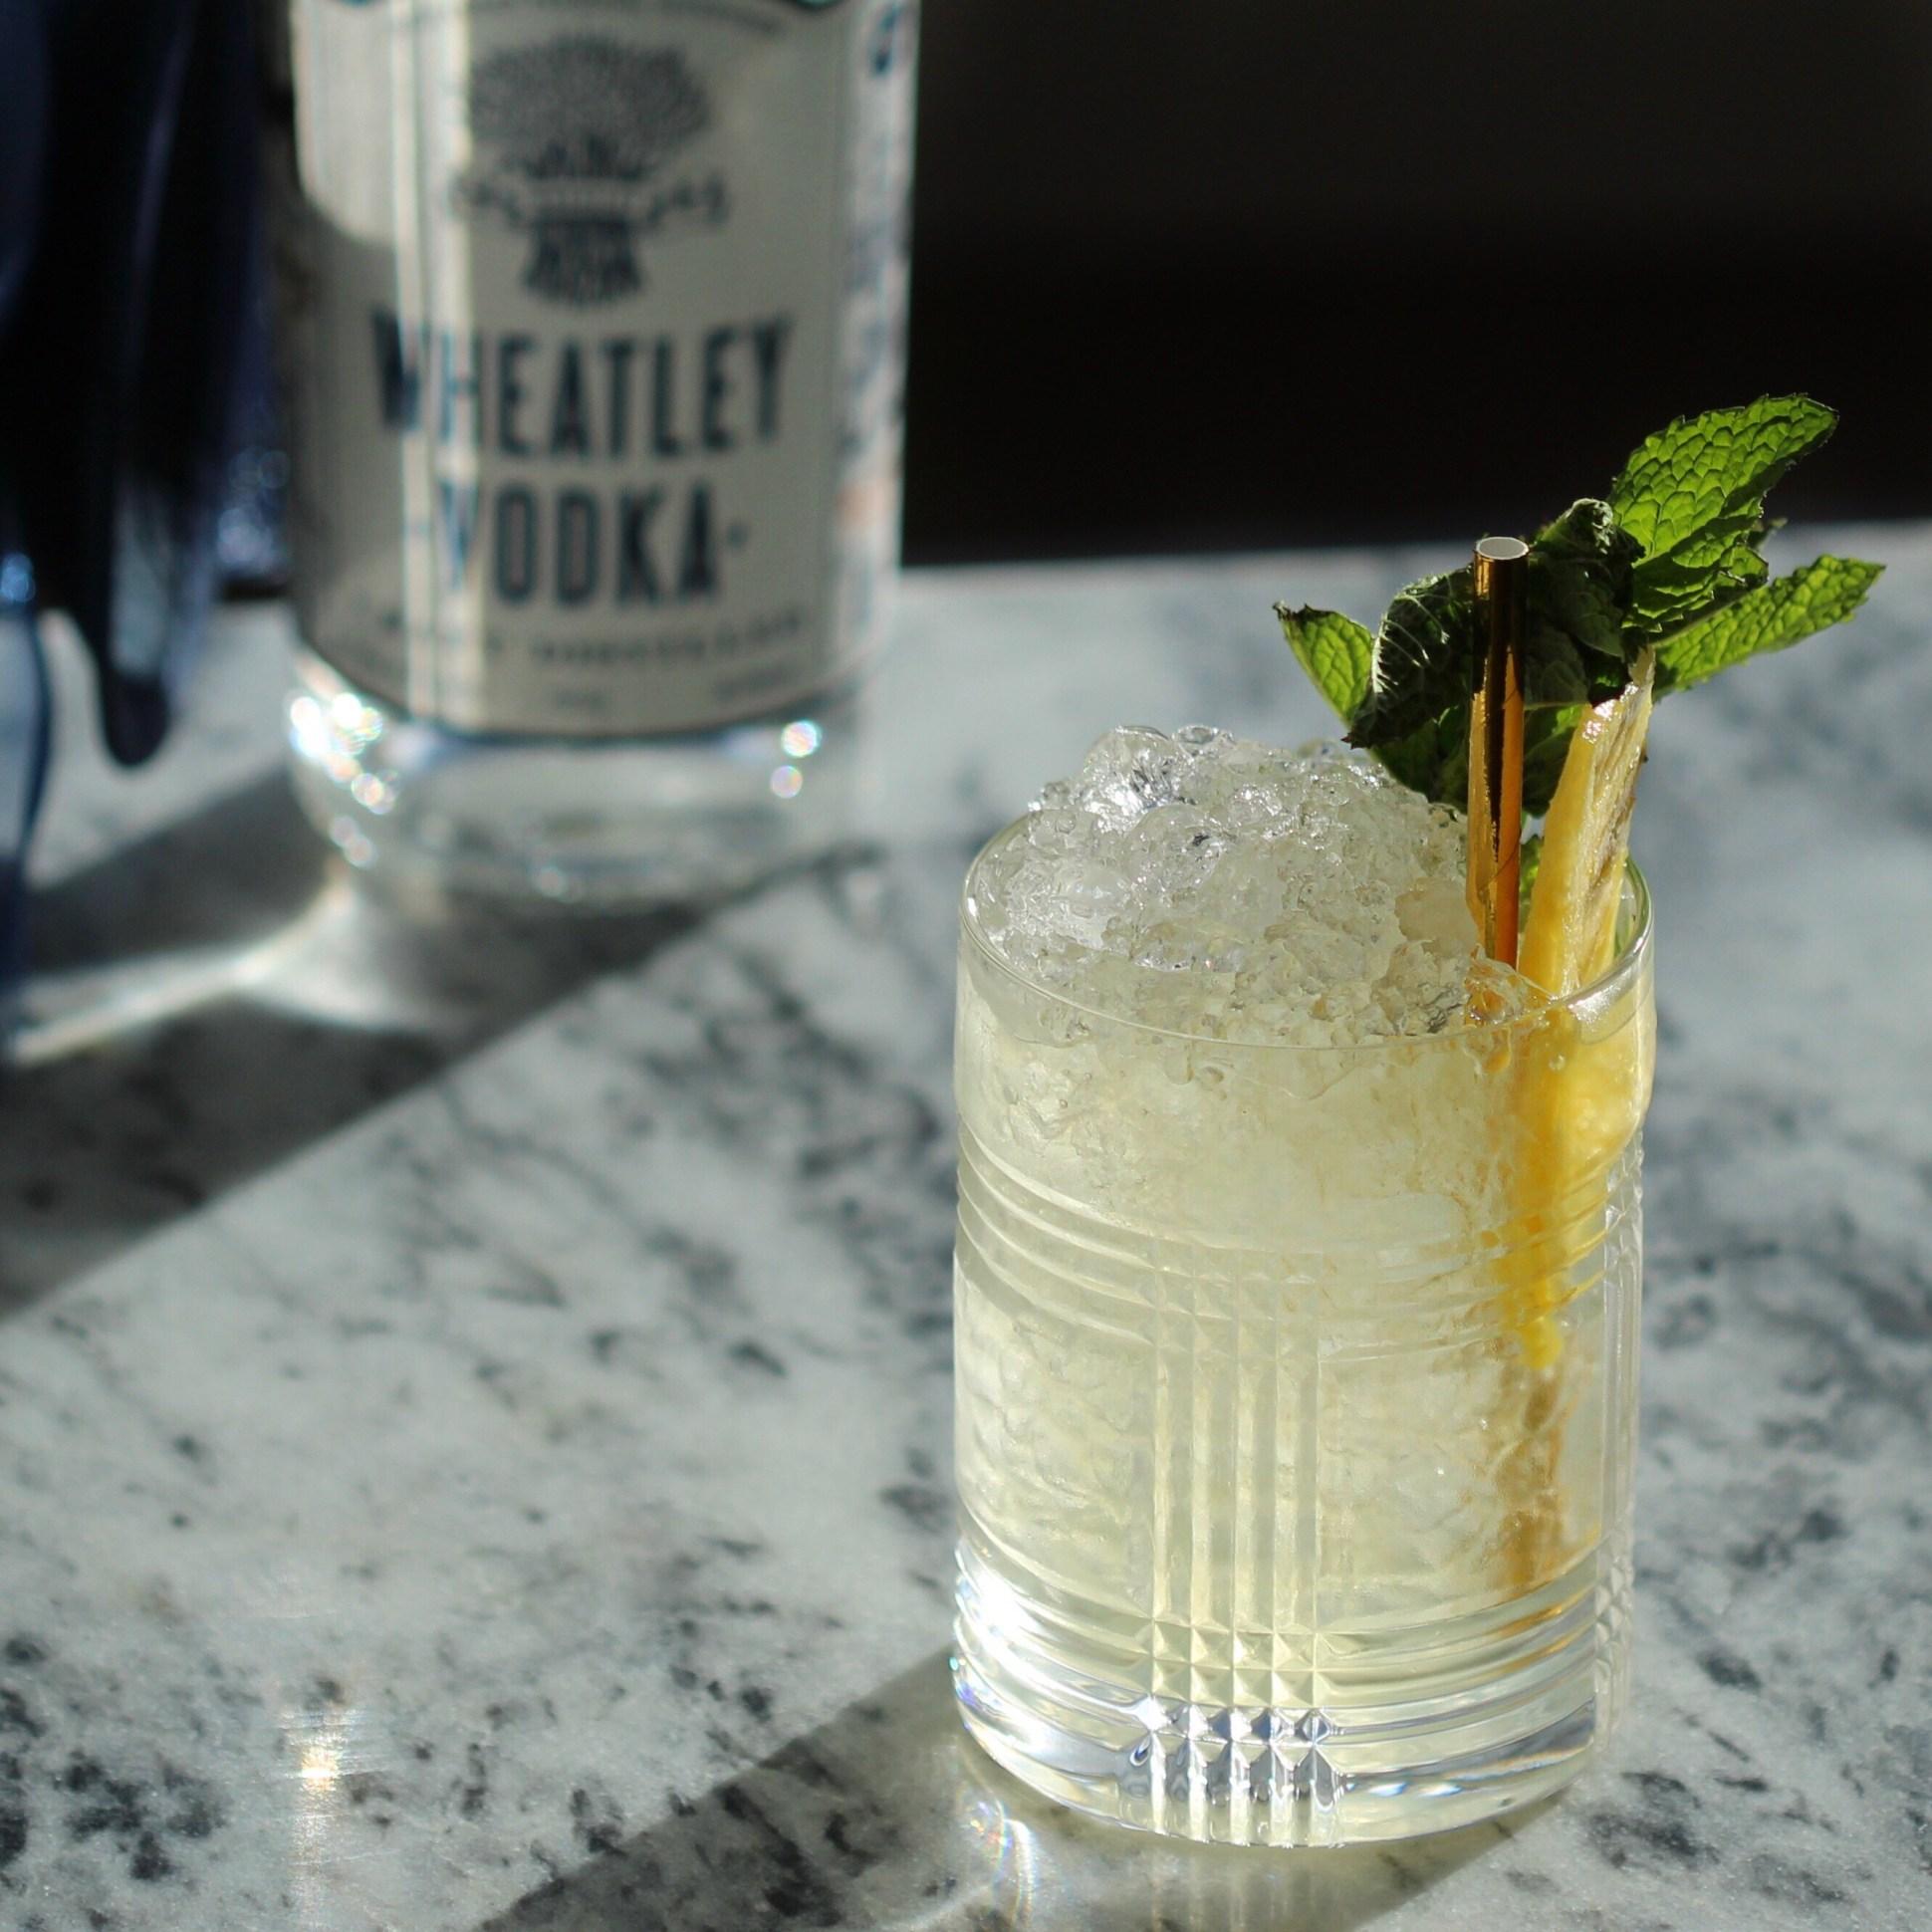 wheatley vodka pineapple mint julep -